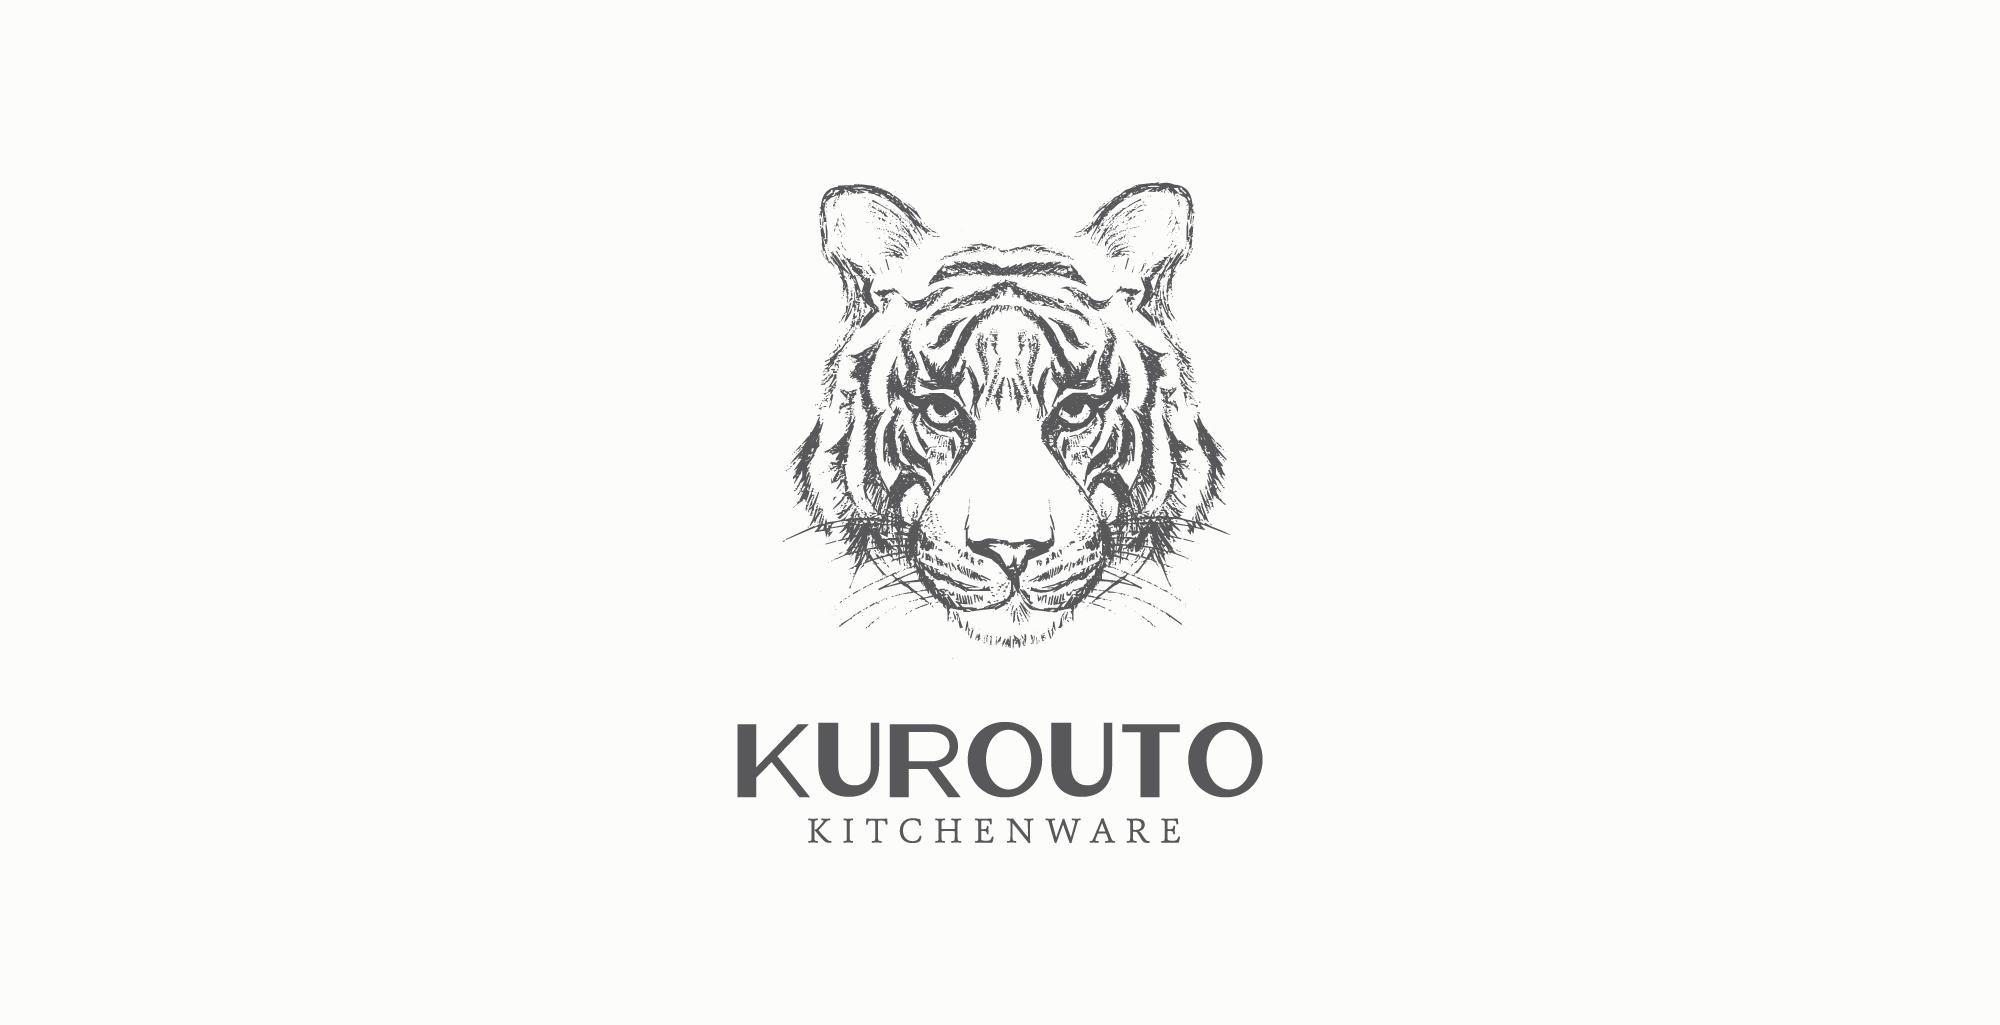 Brand Identity Design by Amarie Design Co. for Kurouto Kitchenware Lifestyle Brand